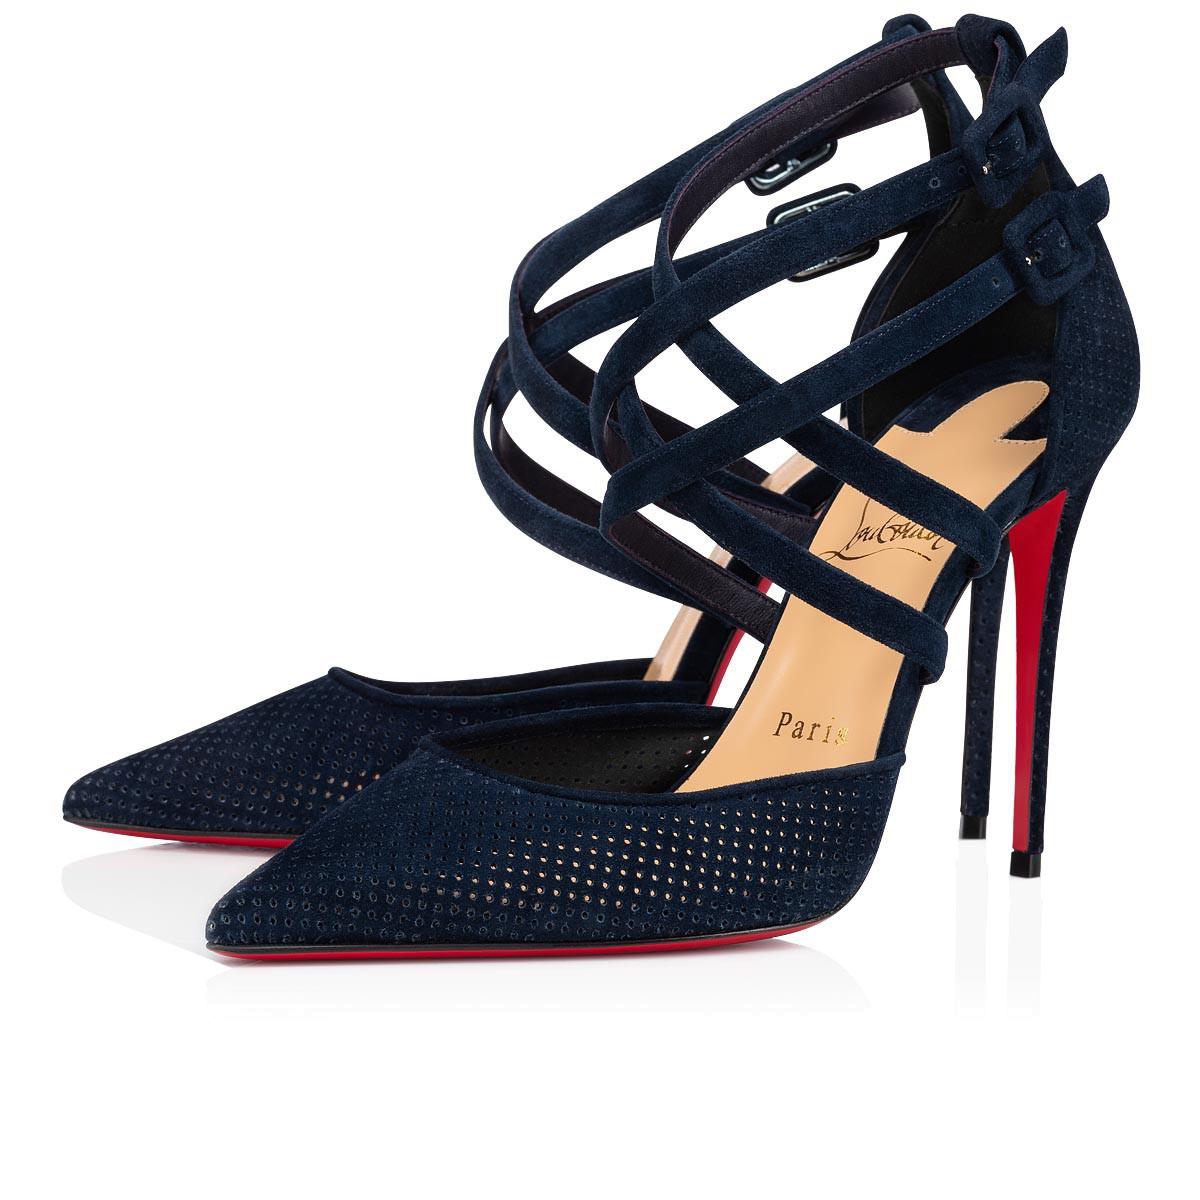 Shoes - Victorilla - Christian Louboutin